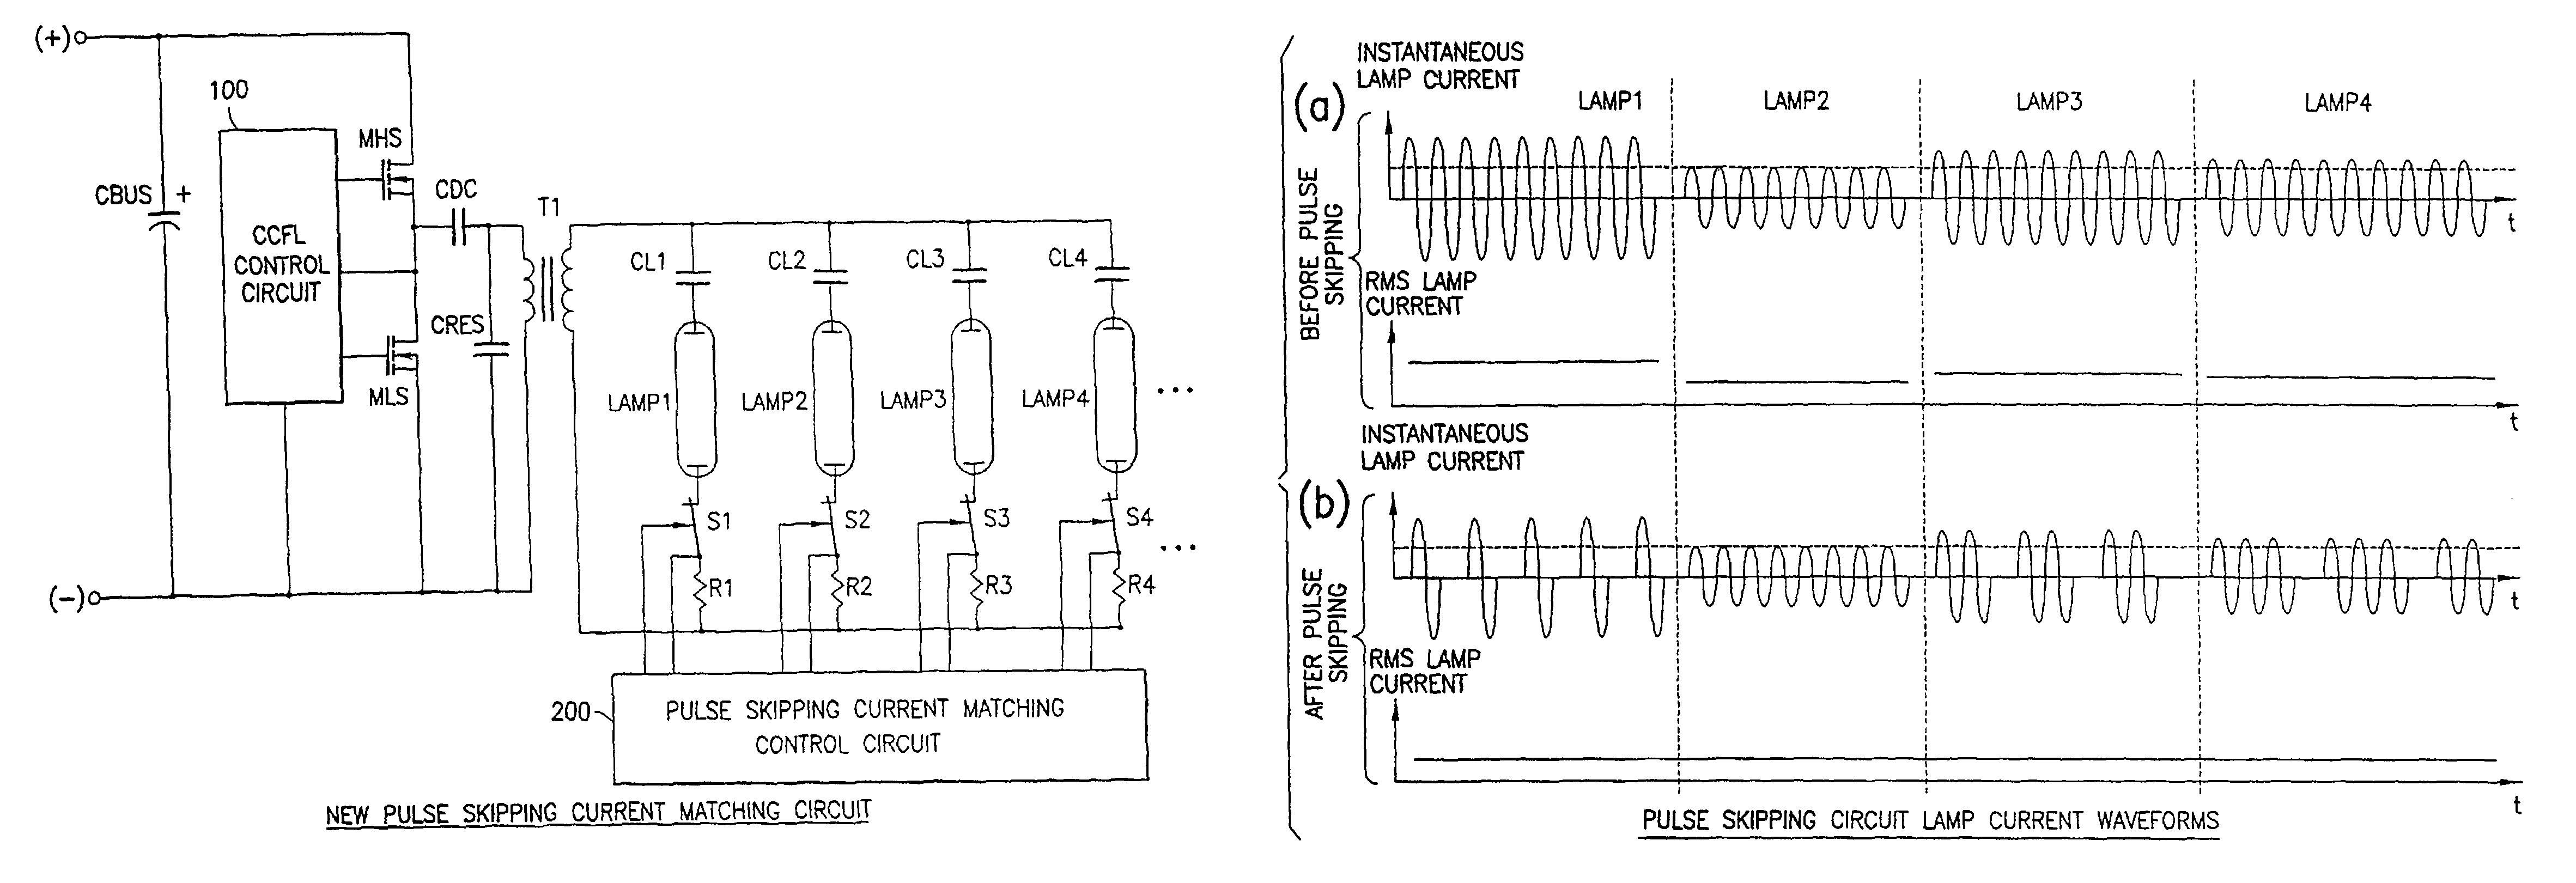 Patent Us8344658 Cold Cathode Fluorescent Lamp Multiple Light Circuit Diagram Drawing